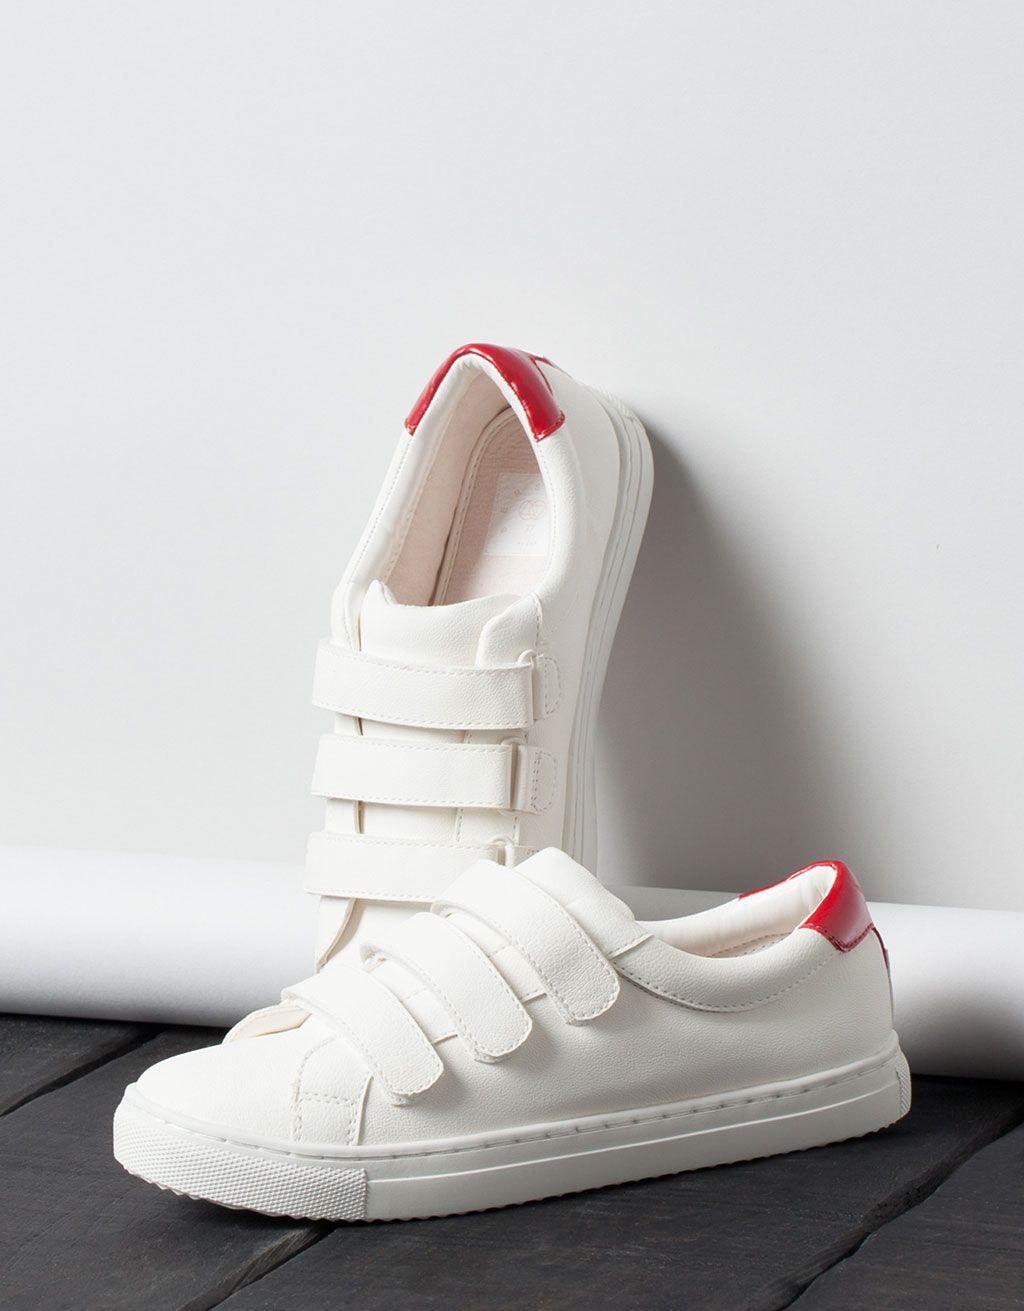 tennis mode bsk chaussures bershka france shoe pinterest mode. Black Bedroom Furniture Sets. Home Design Ideas